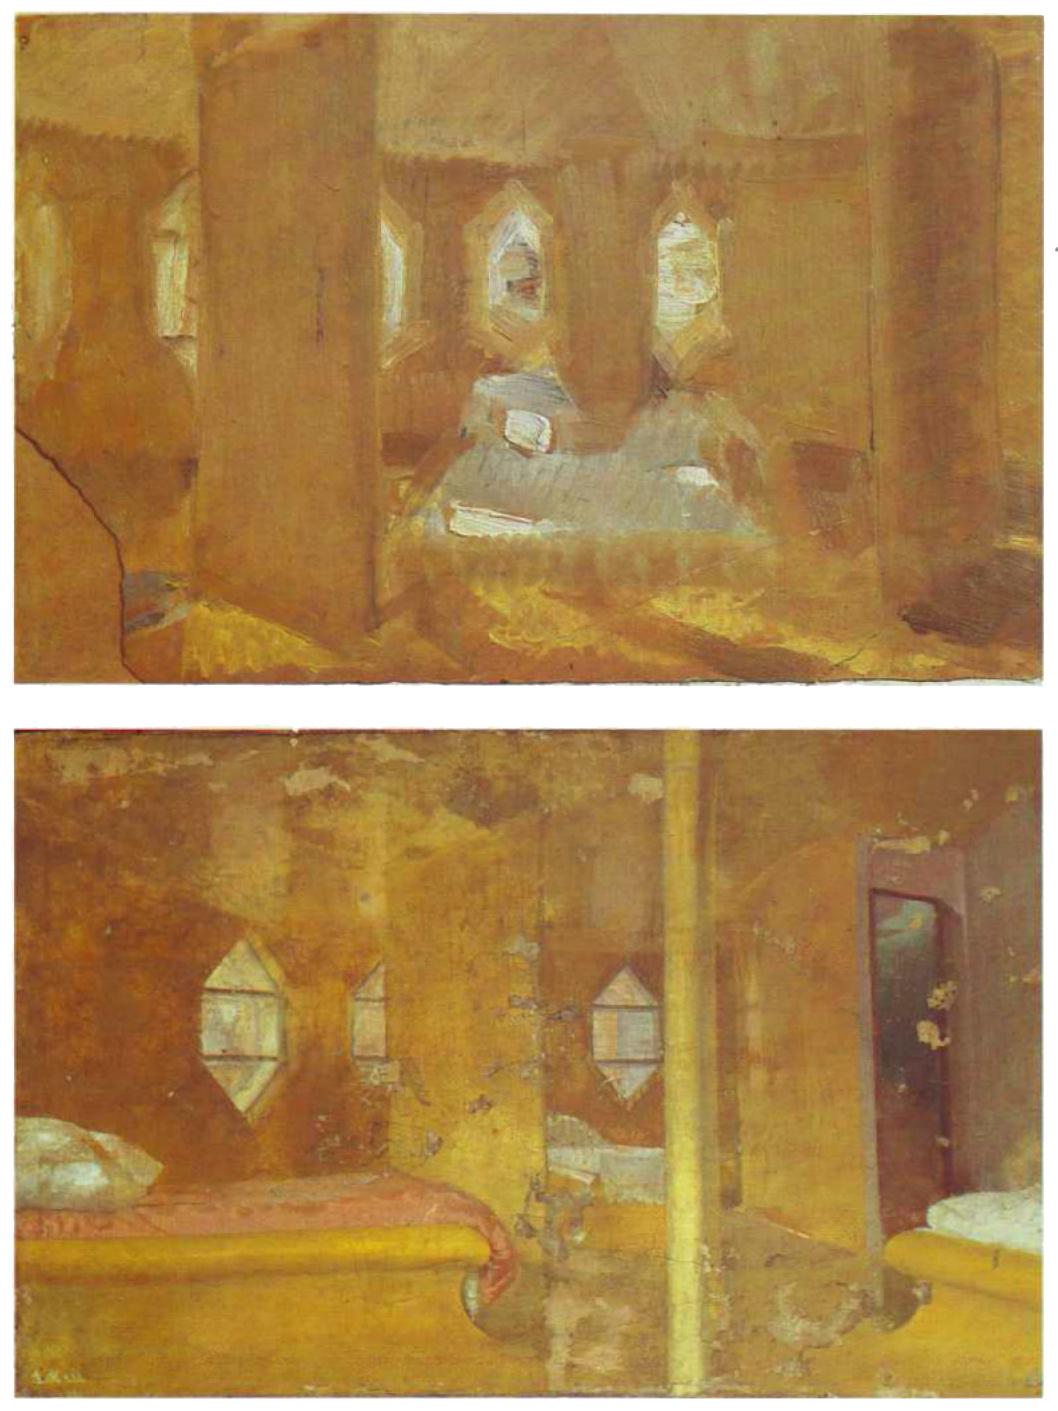 Konstantin Mel'nikov, paintings of the bedroom in icon-like gold (1929)